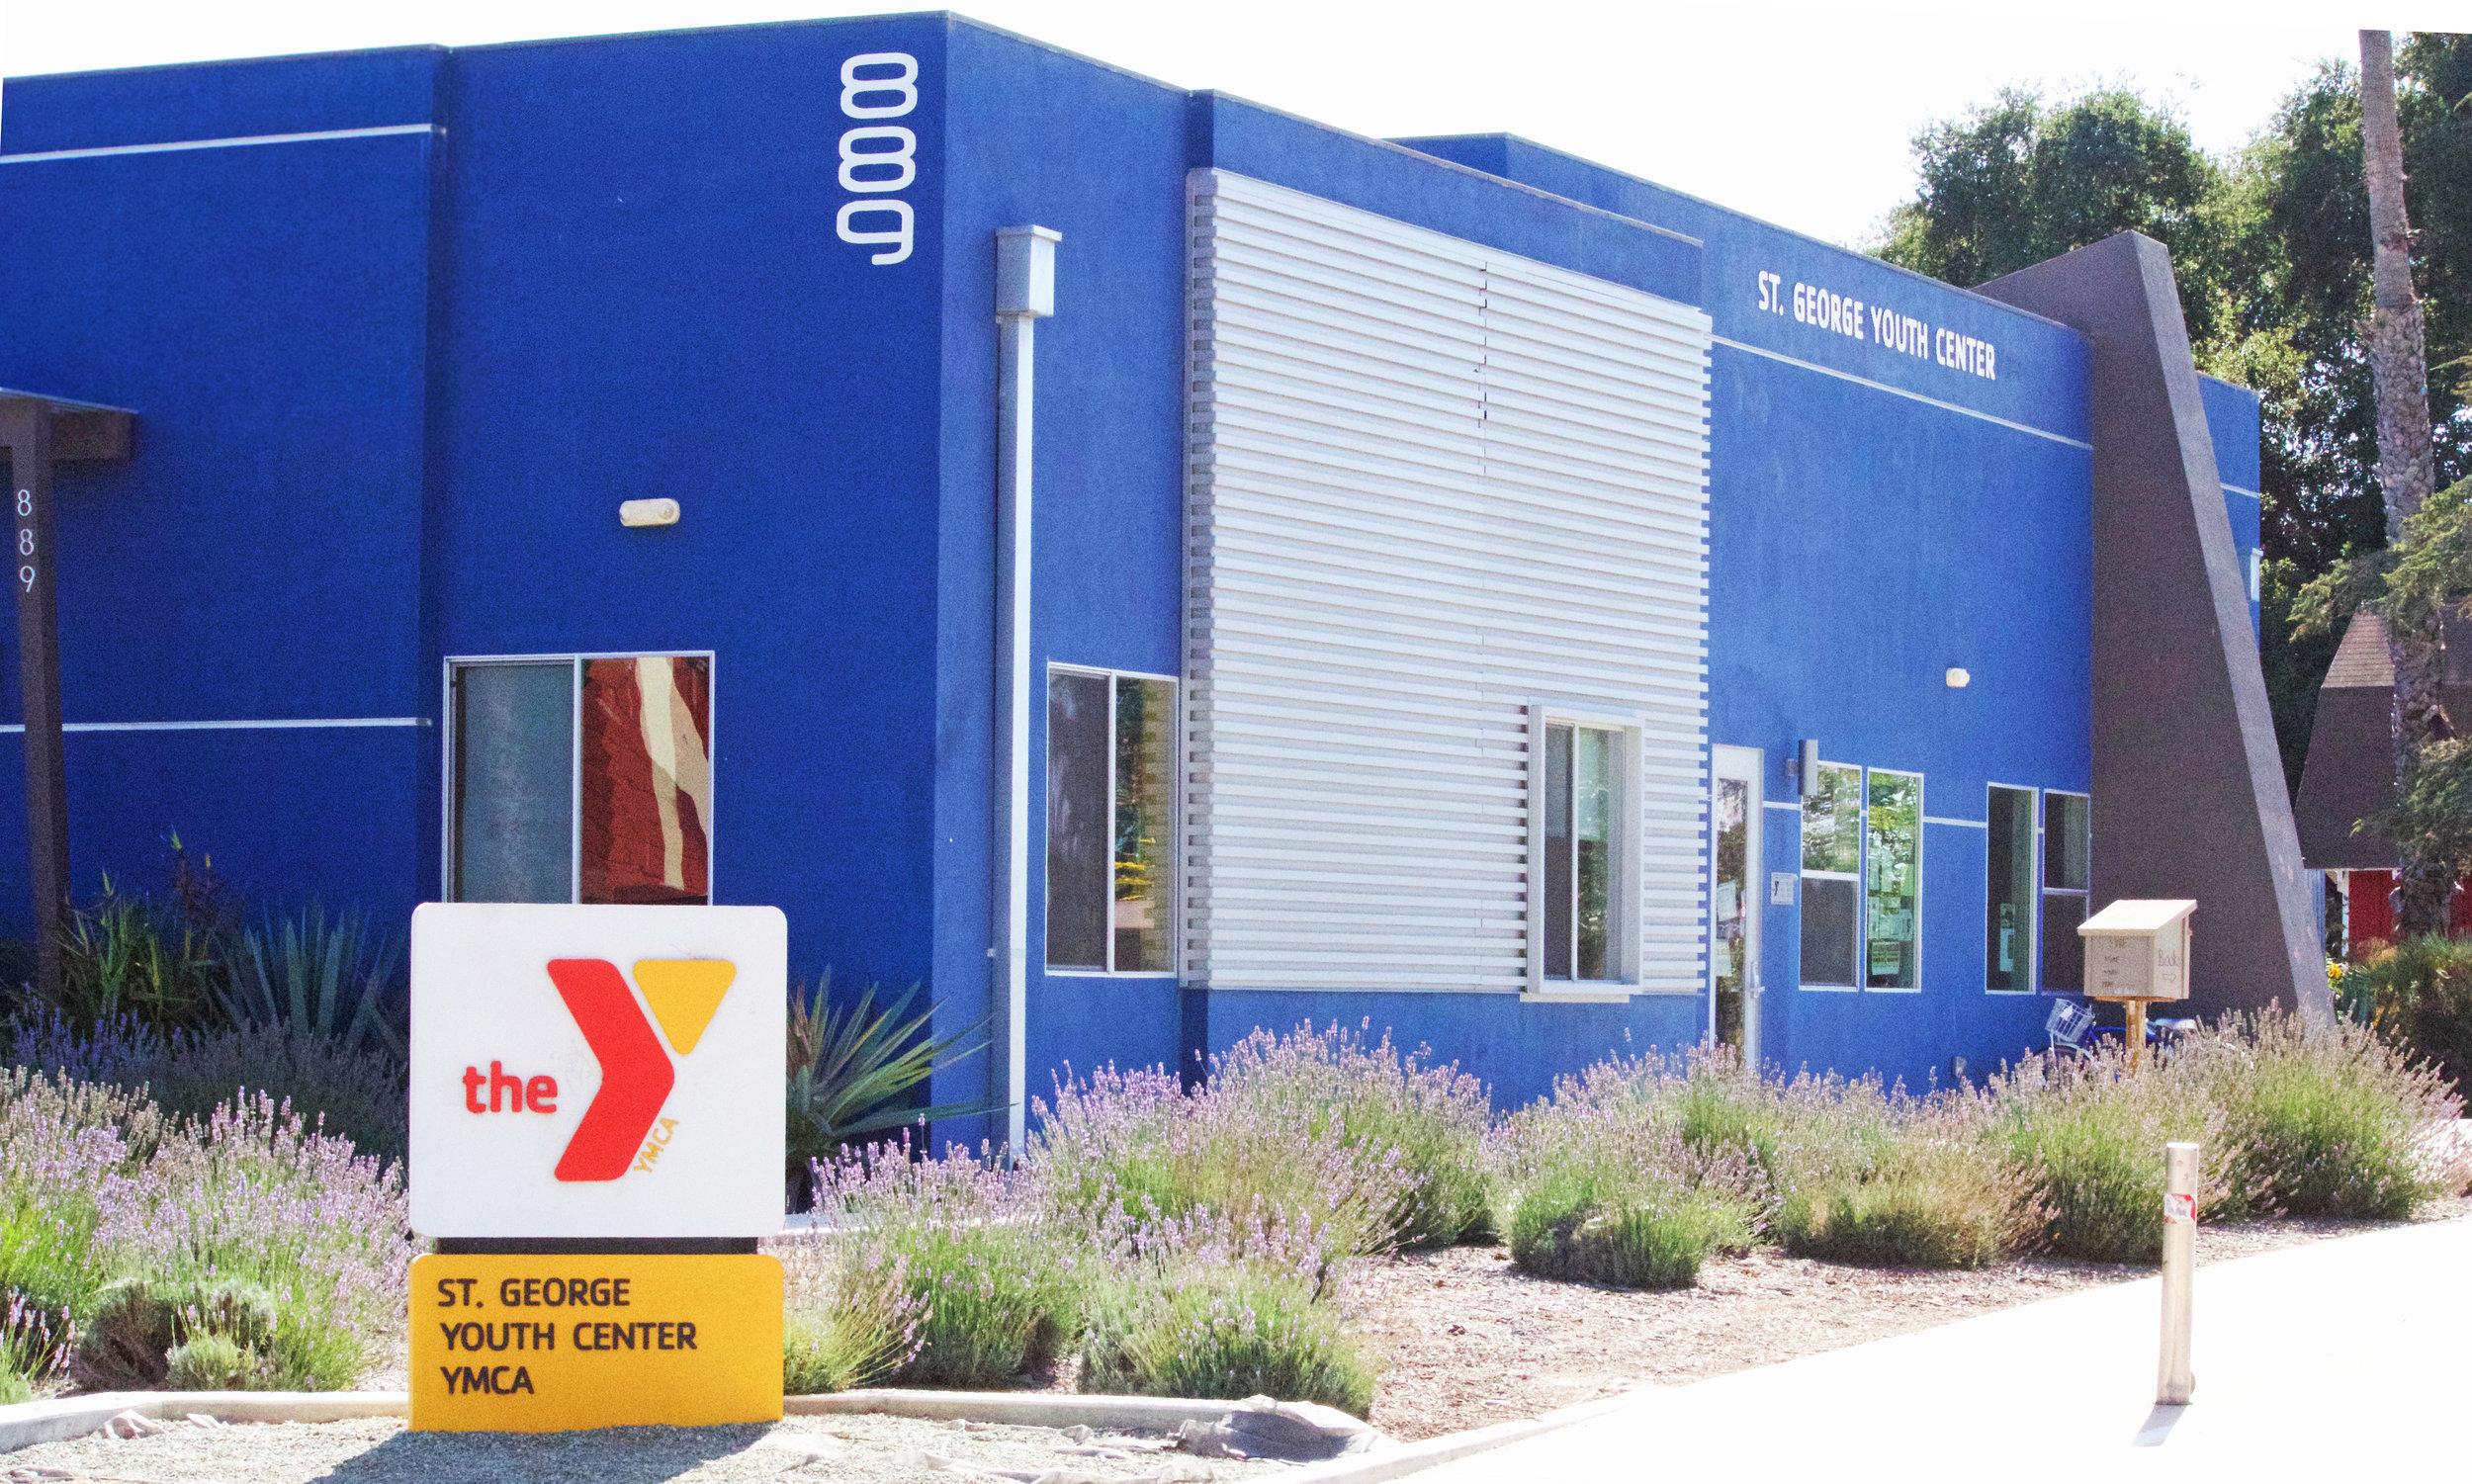 YMCA_COLORFIX.jpg